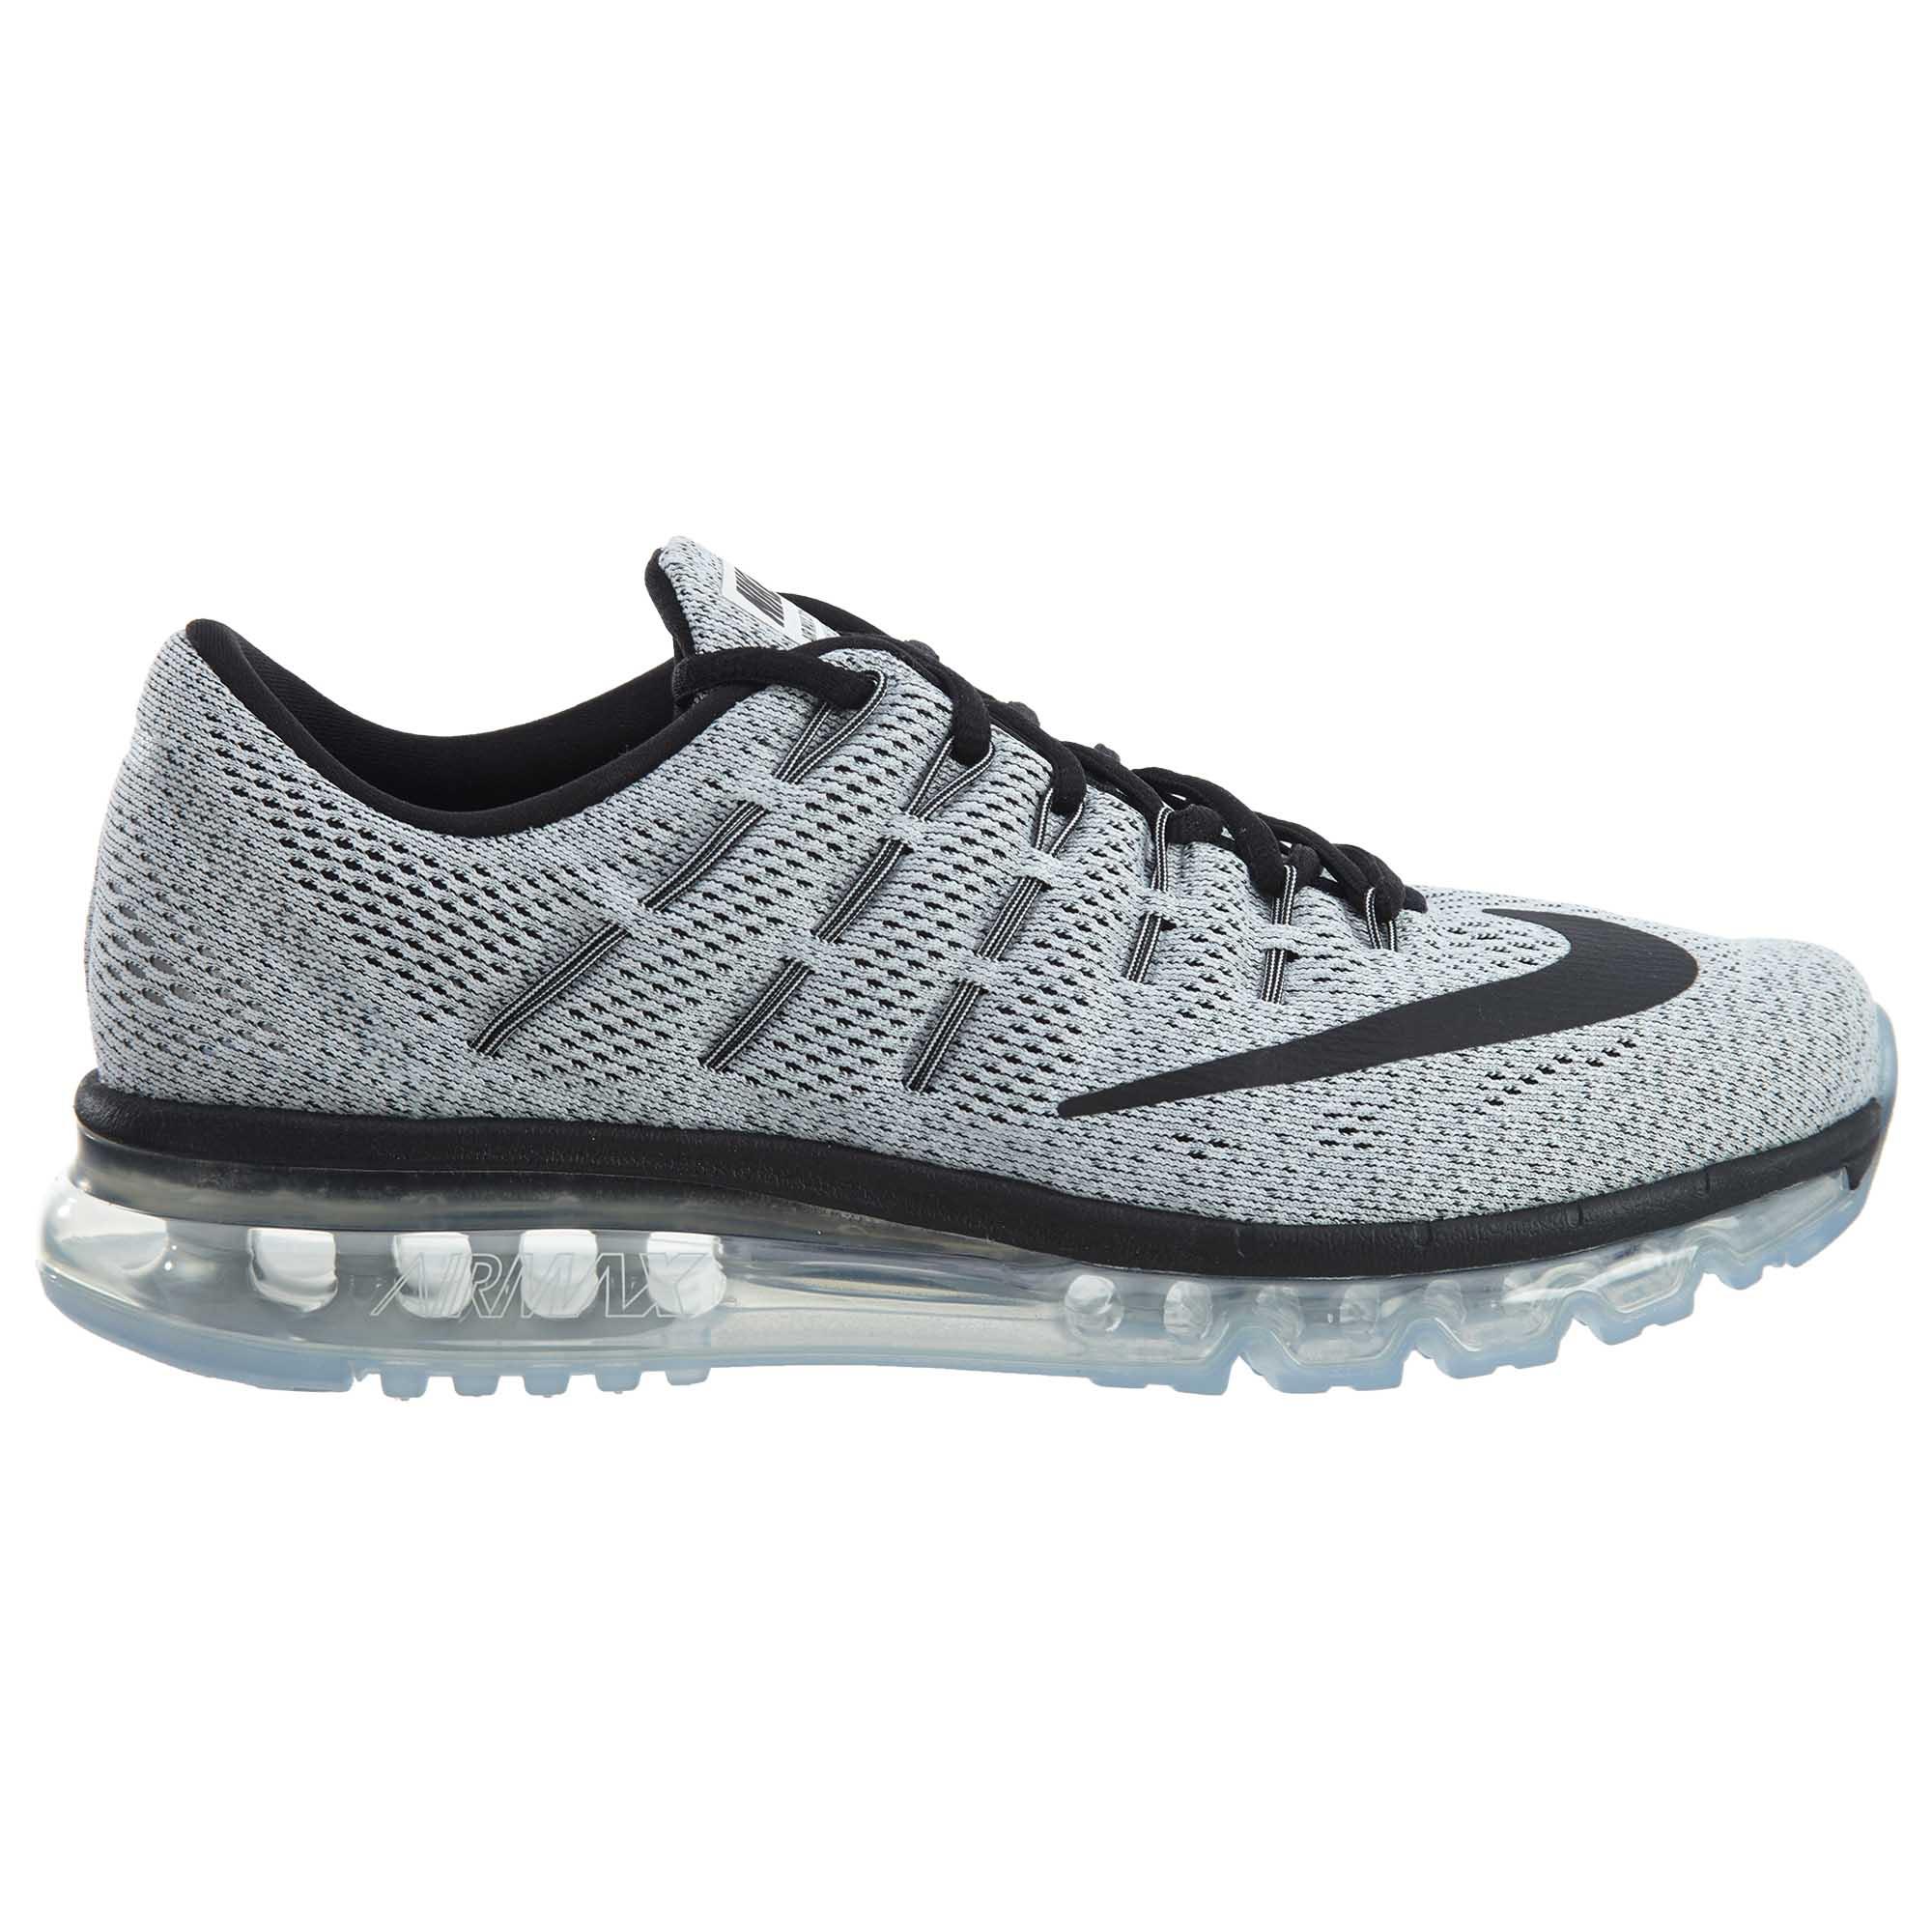 Nike Air Max 2016 White Black